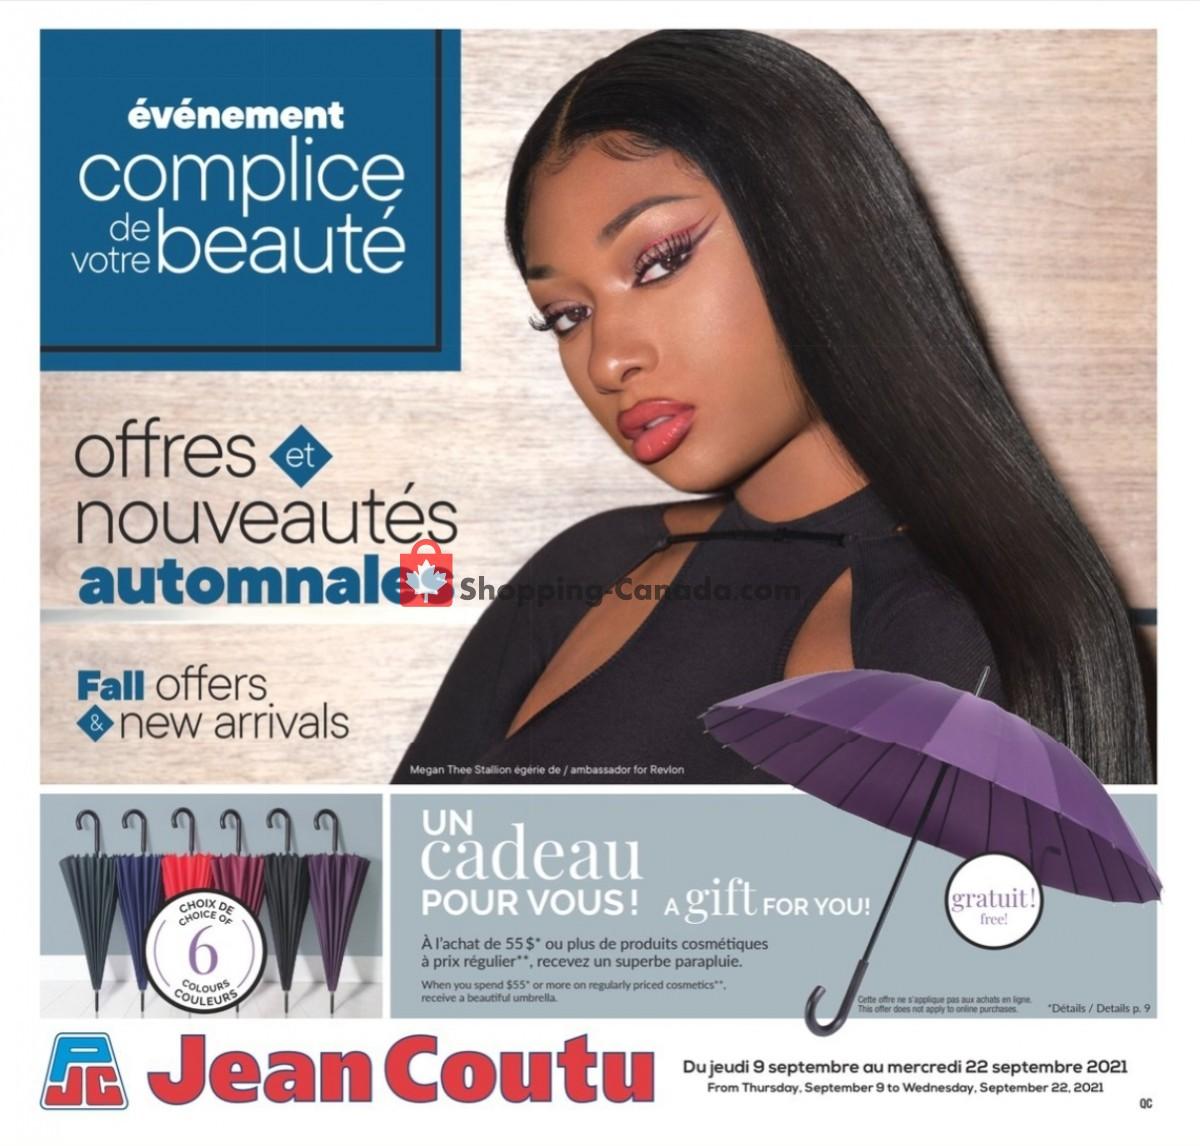 Flyer Jean Coutu Pharmacy Canada - from Thursday September 9, 2021 to Wednesday September 22, 2021